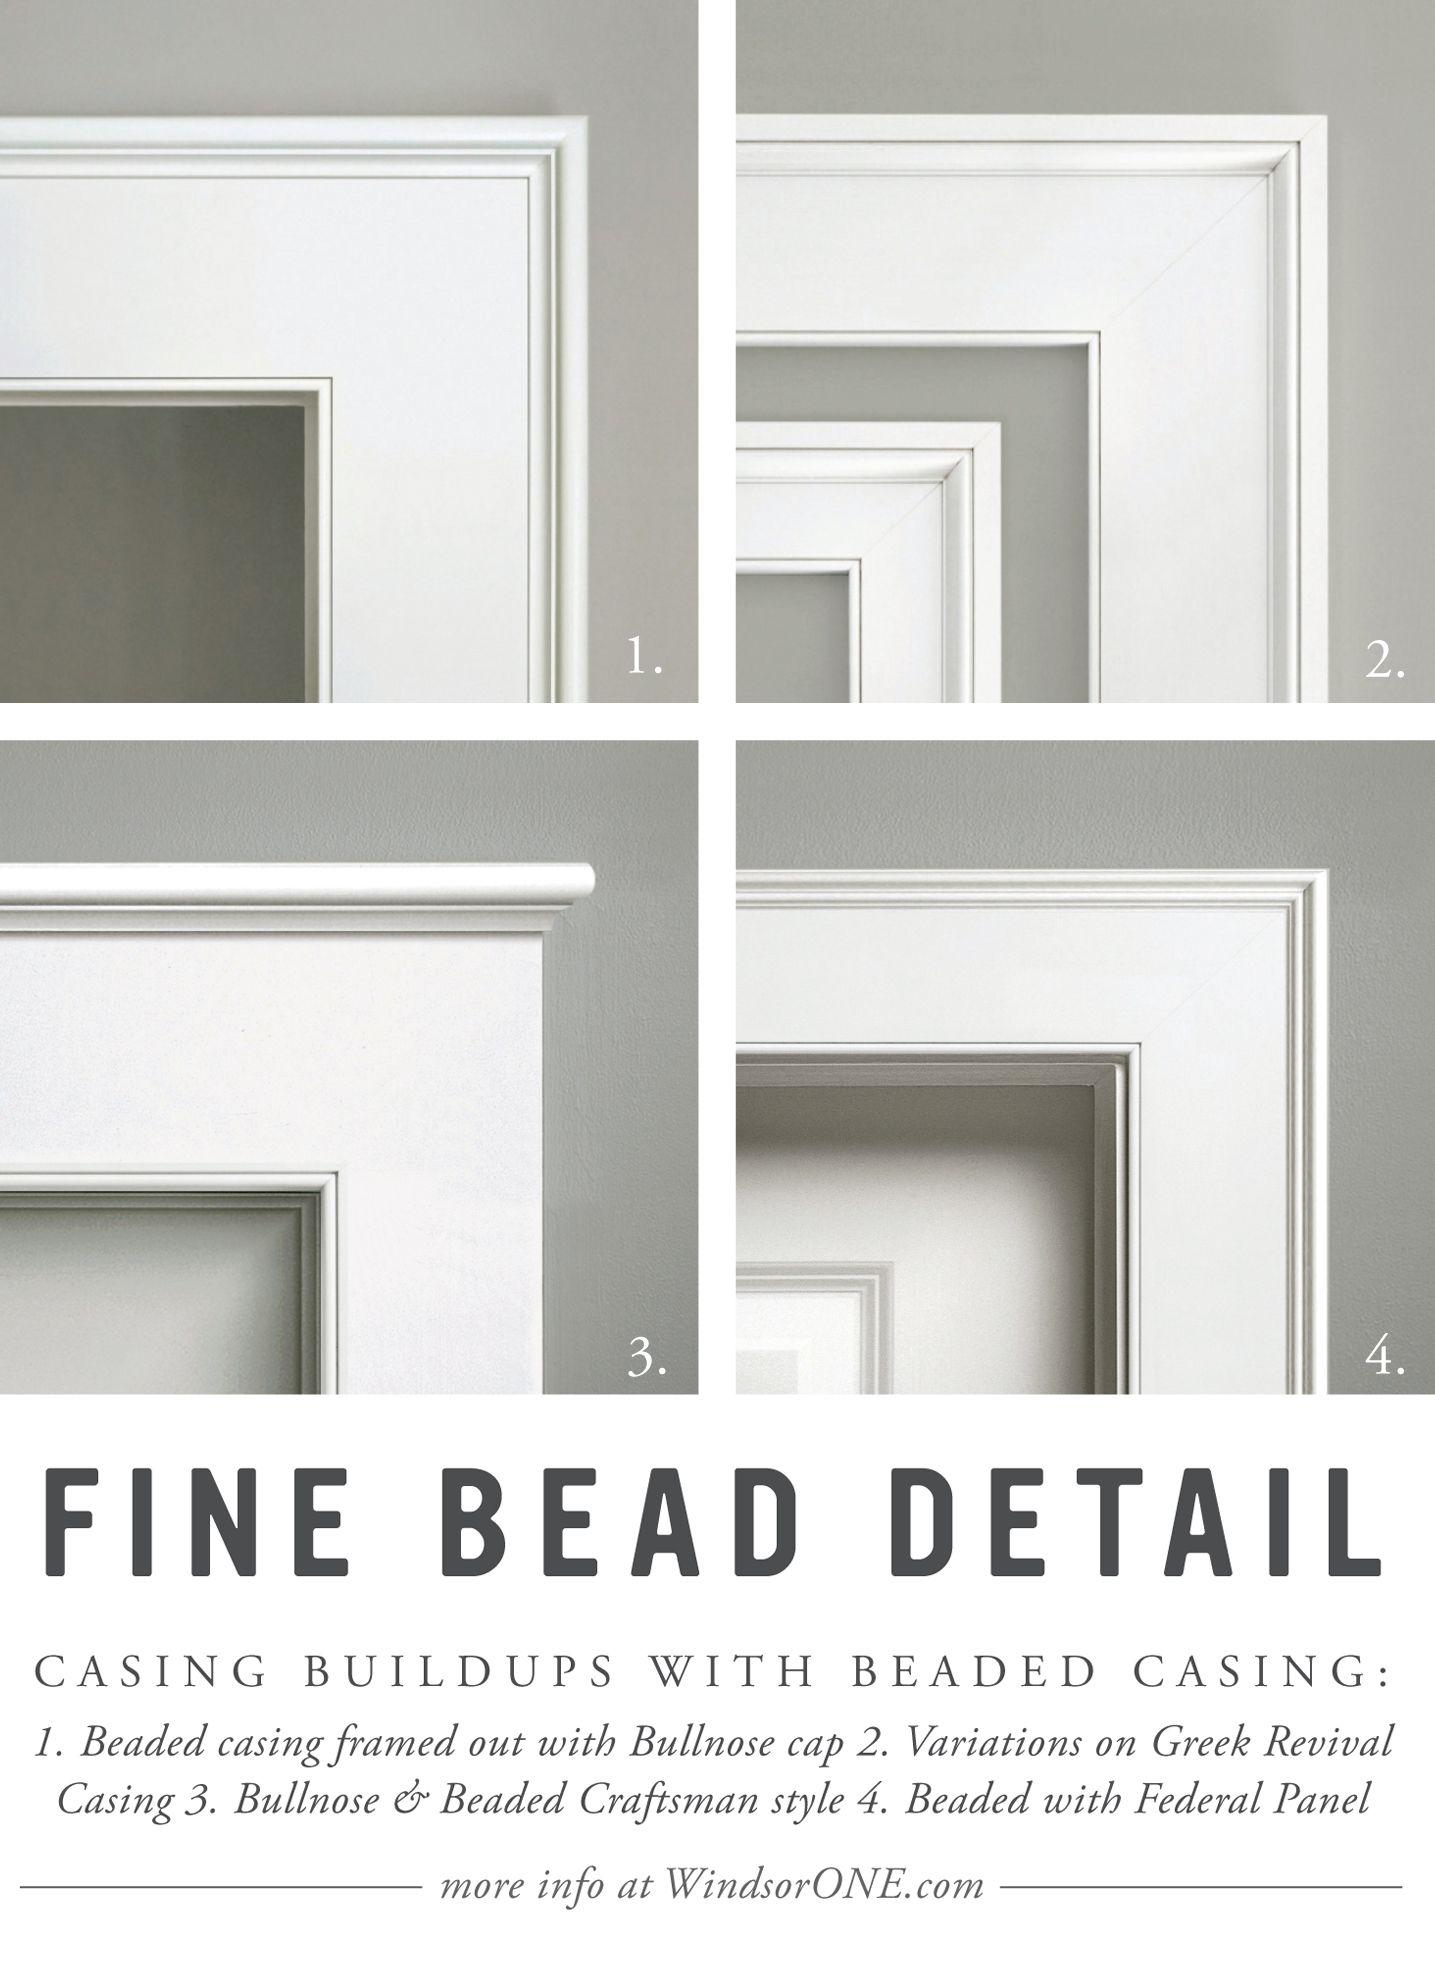 Beaded Casing Wood Trim Detail For Windows Doors More Windsorone Moldings And Trim Interior Window Trim Fireplace Trim